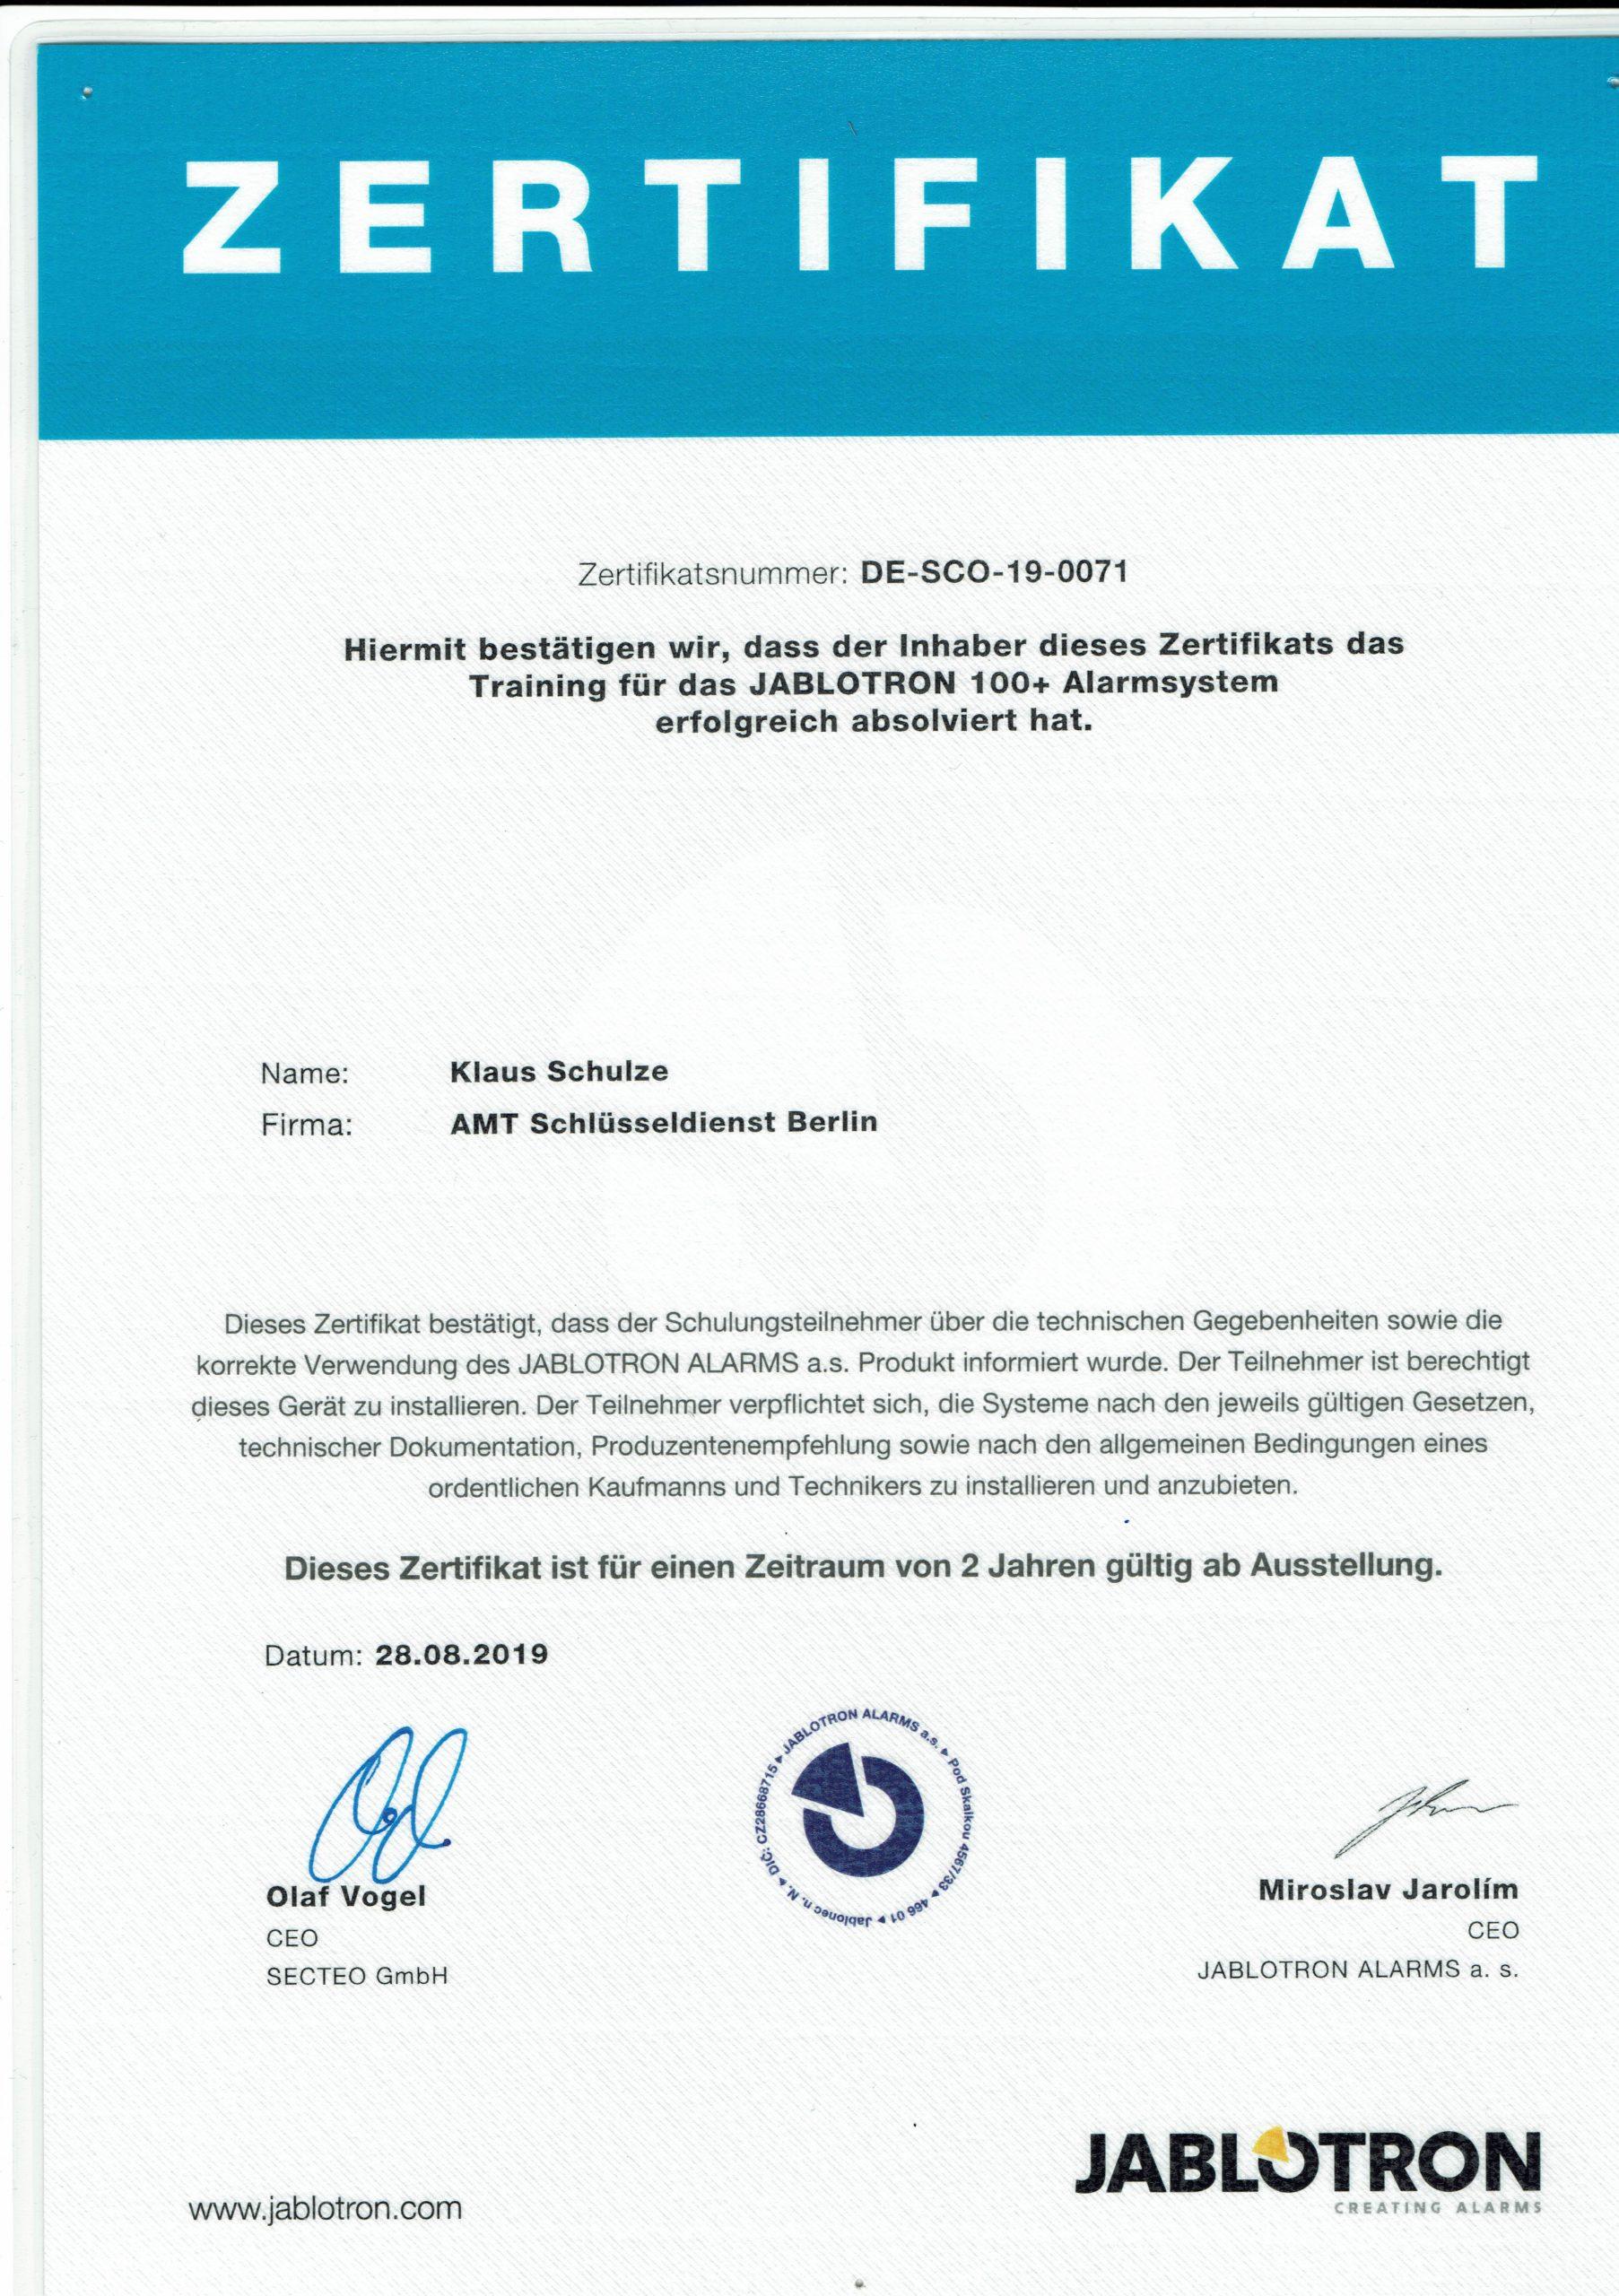 Zertifikat Jablotron